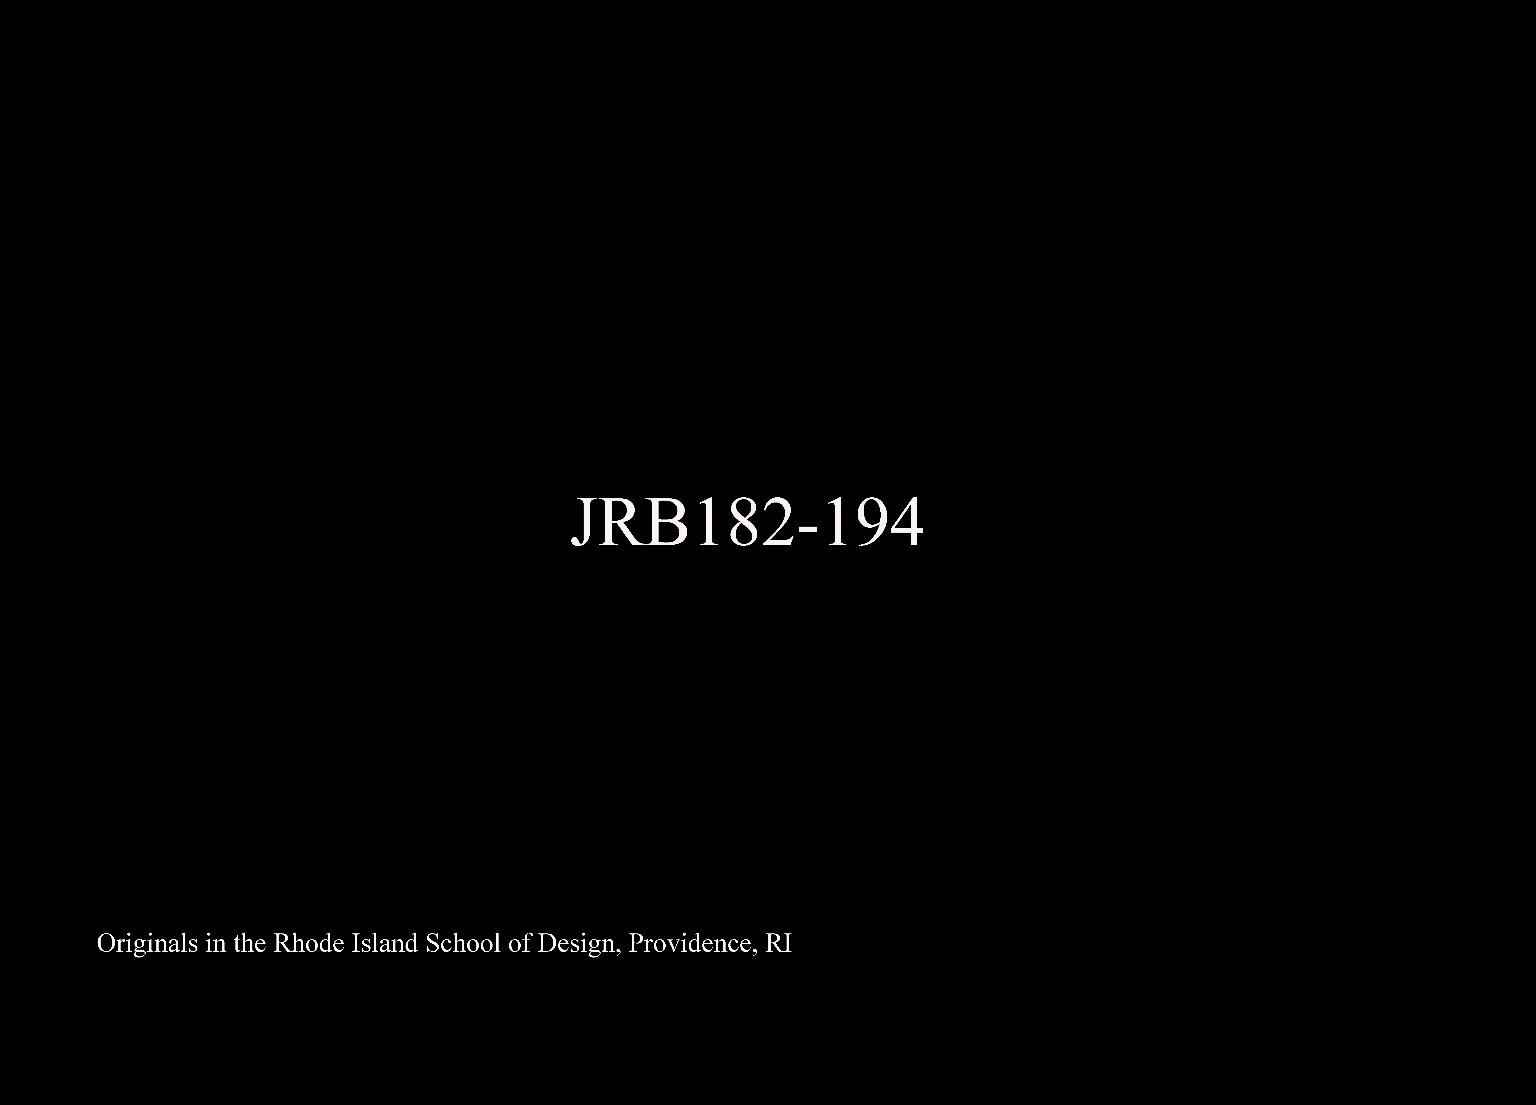 JRB182-194